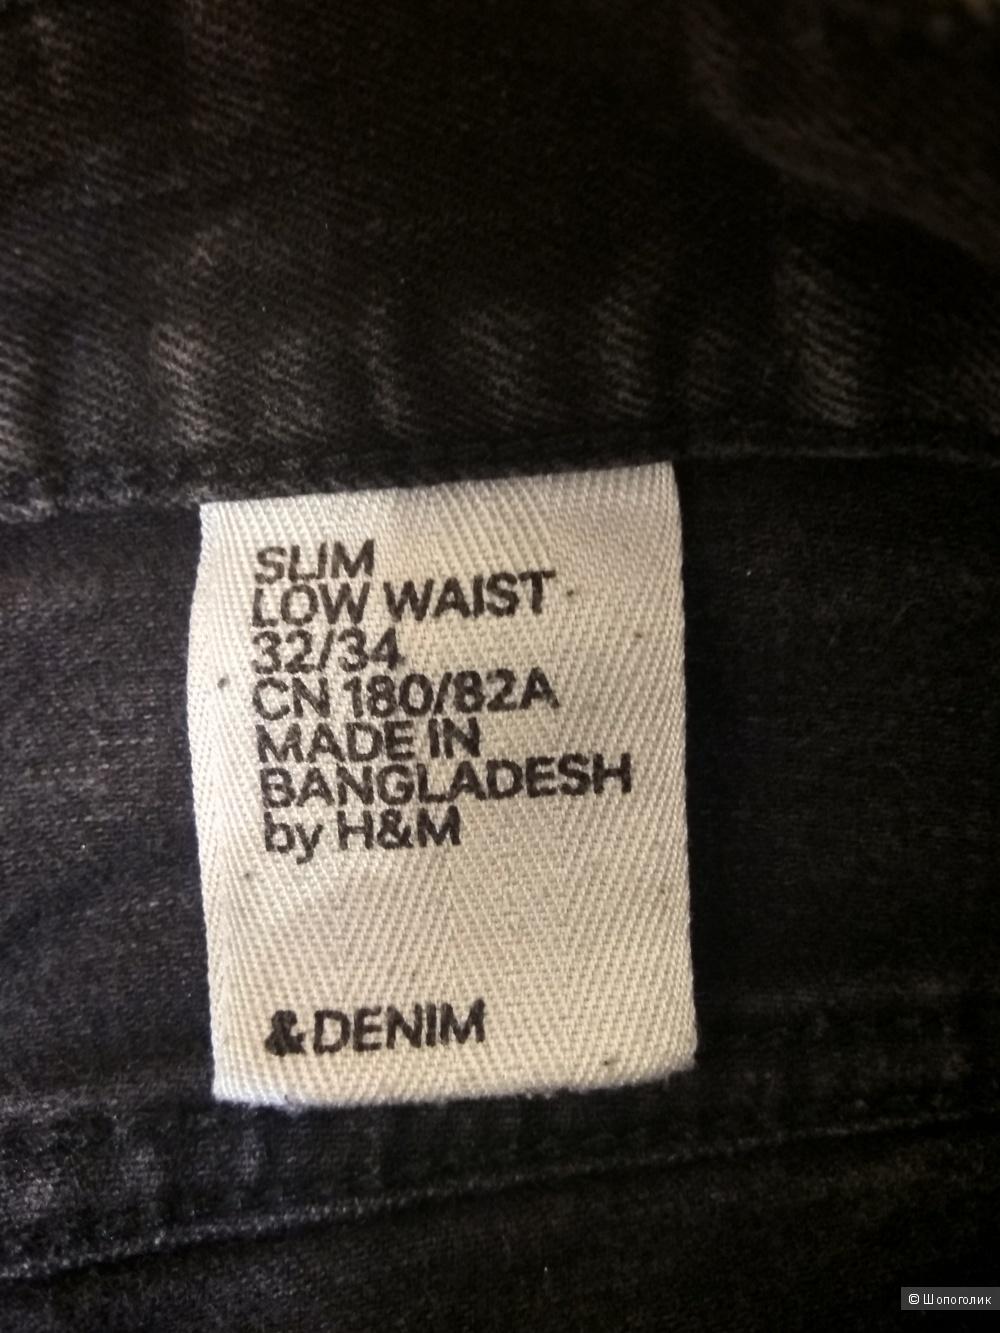 Джинсы, размер 32/34, фирма H&M